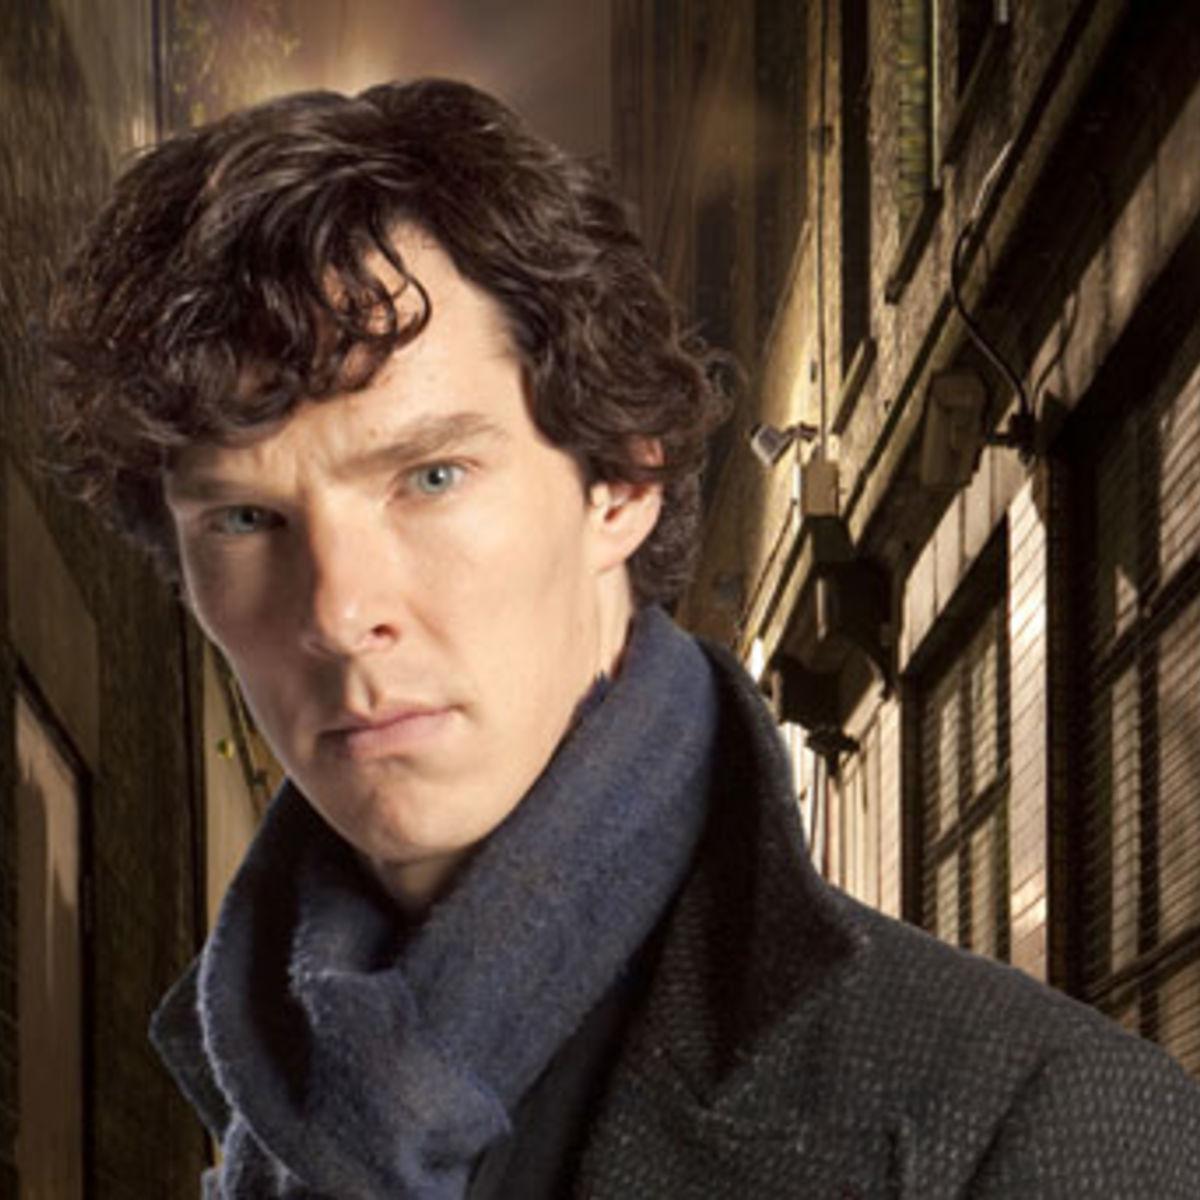 SherlockHolmes012412.jpg